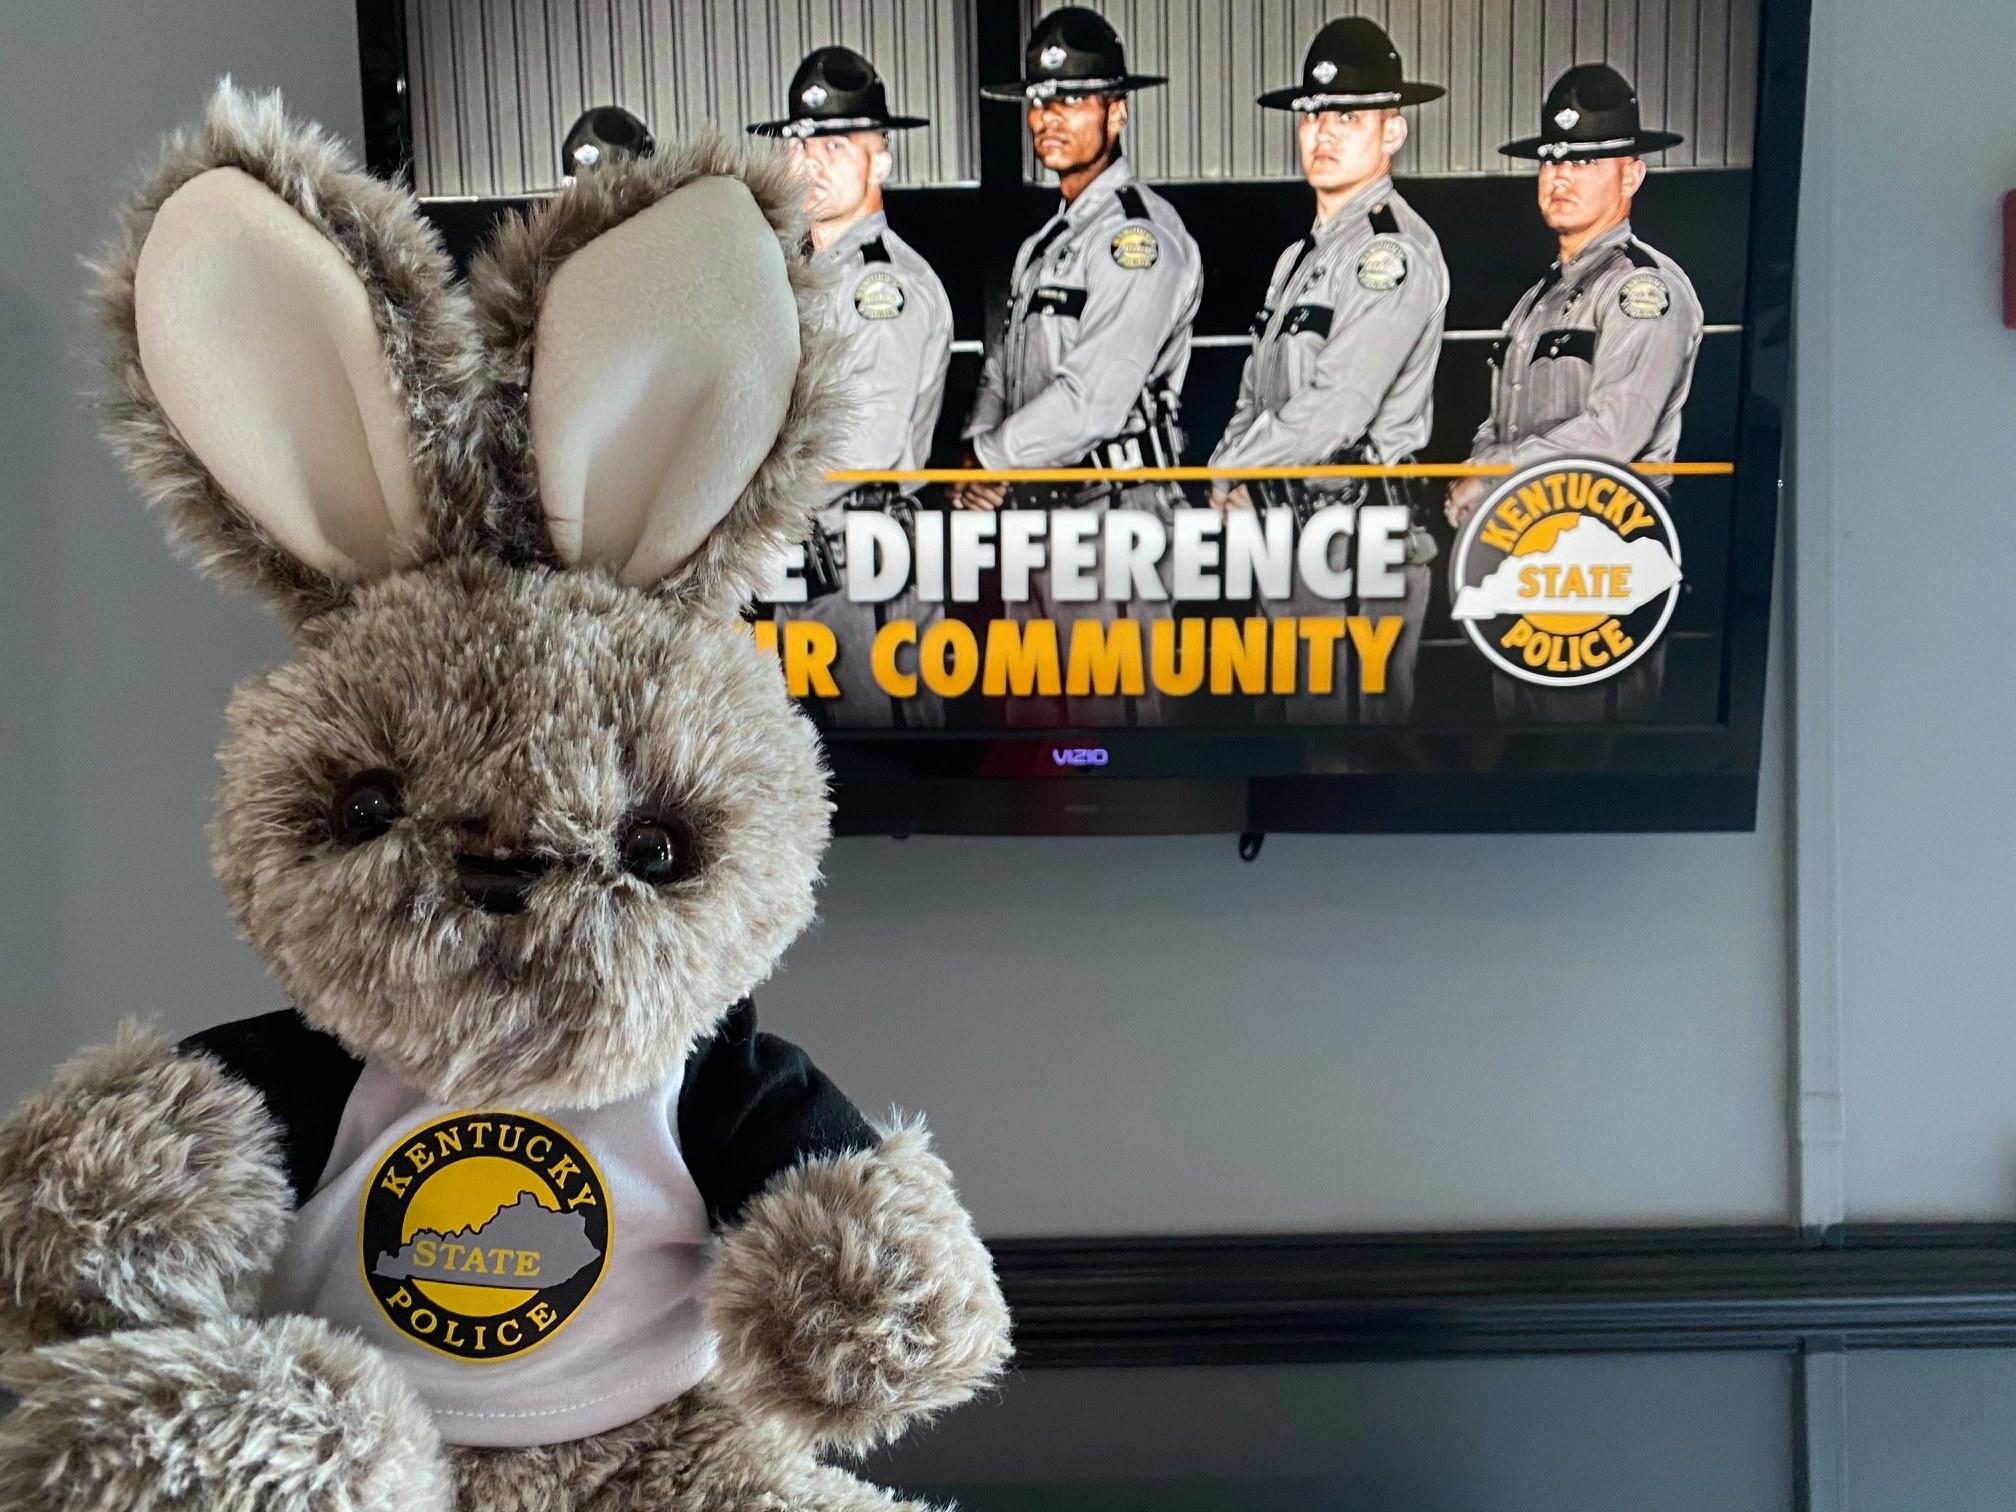 April Fool's prank turns into successful fundraiser for KSP Trooper Teddy program